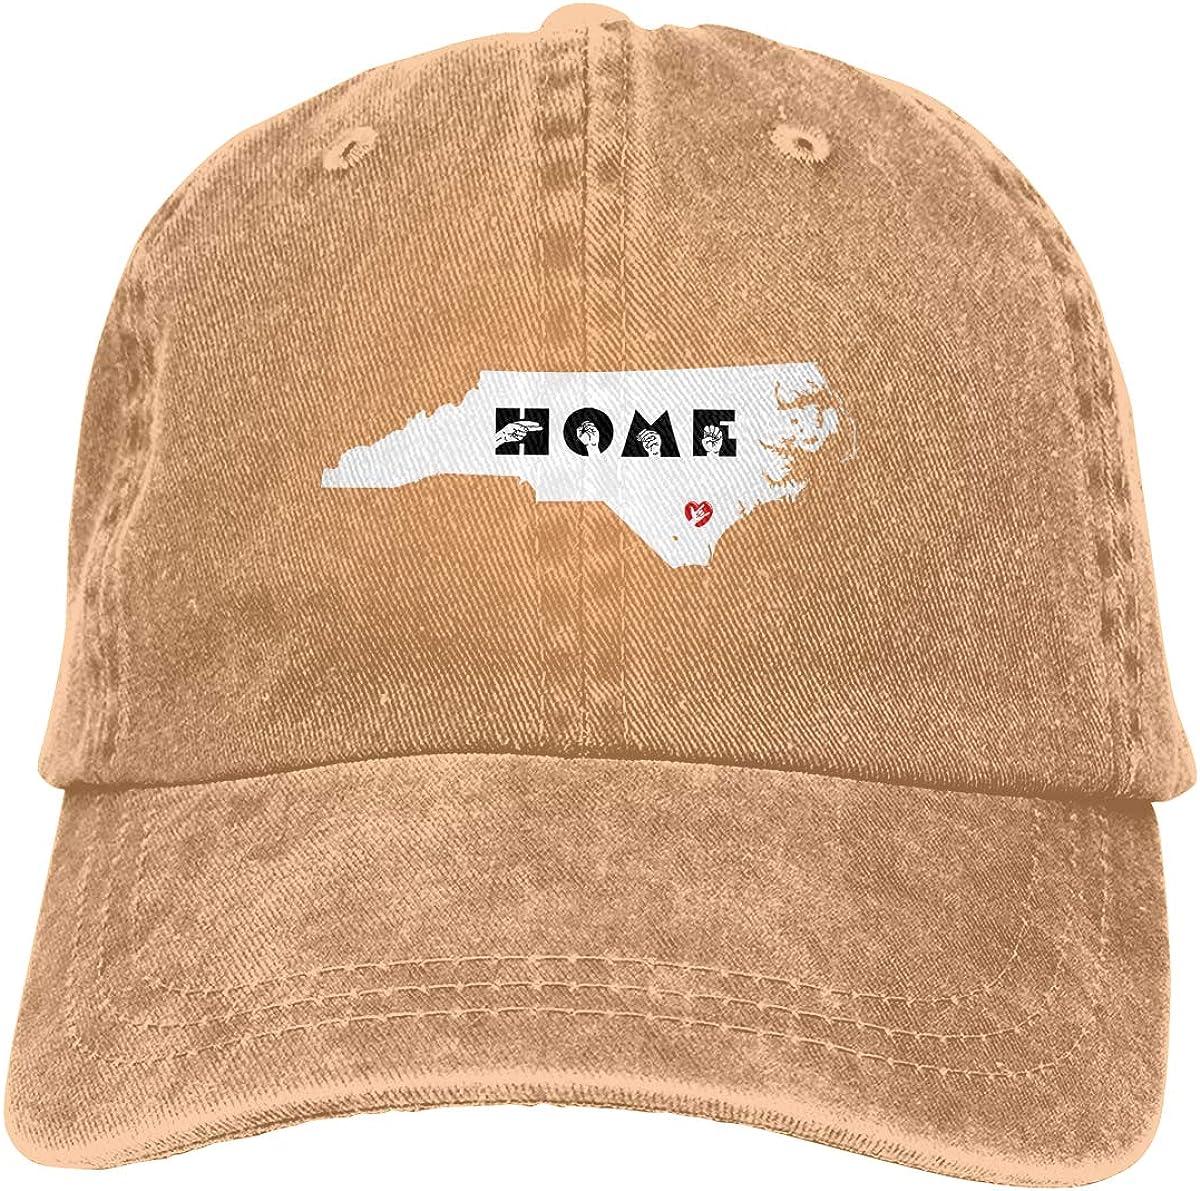 North Carolina Home State Unisex Trucker Hats Dad Baseball Hats Driver Cap